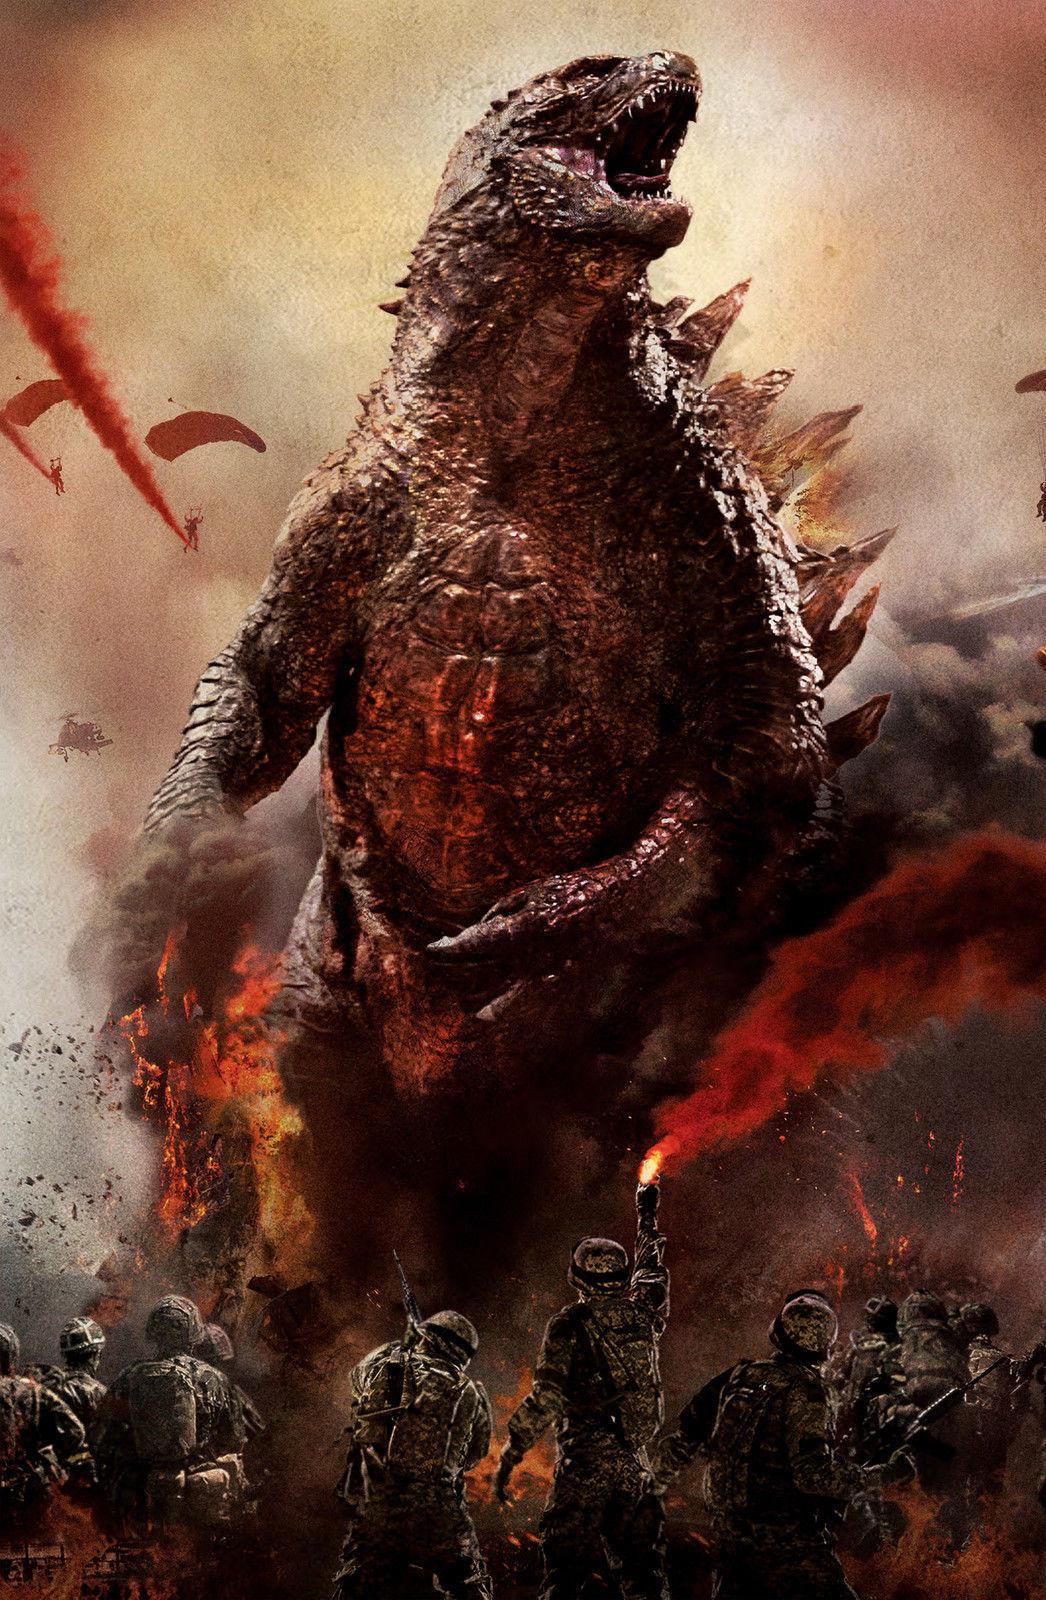 Godzilla Imax 3D Movie Review